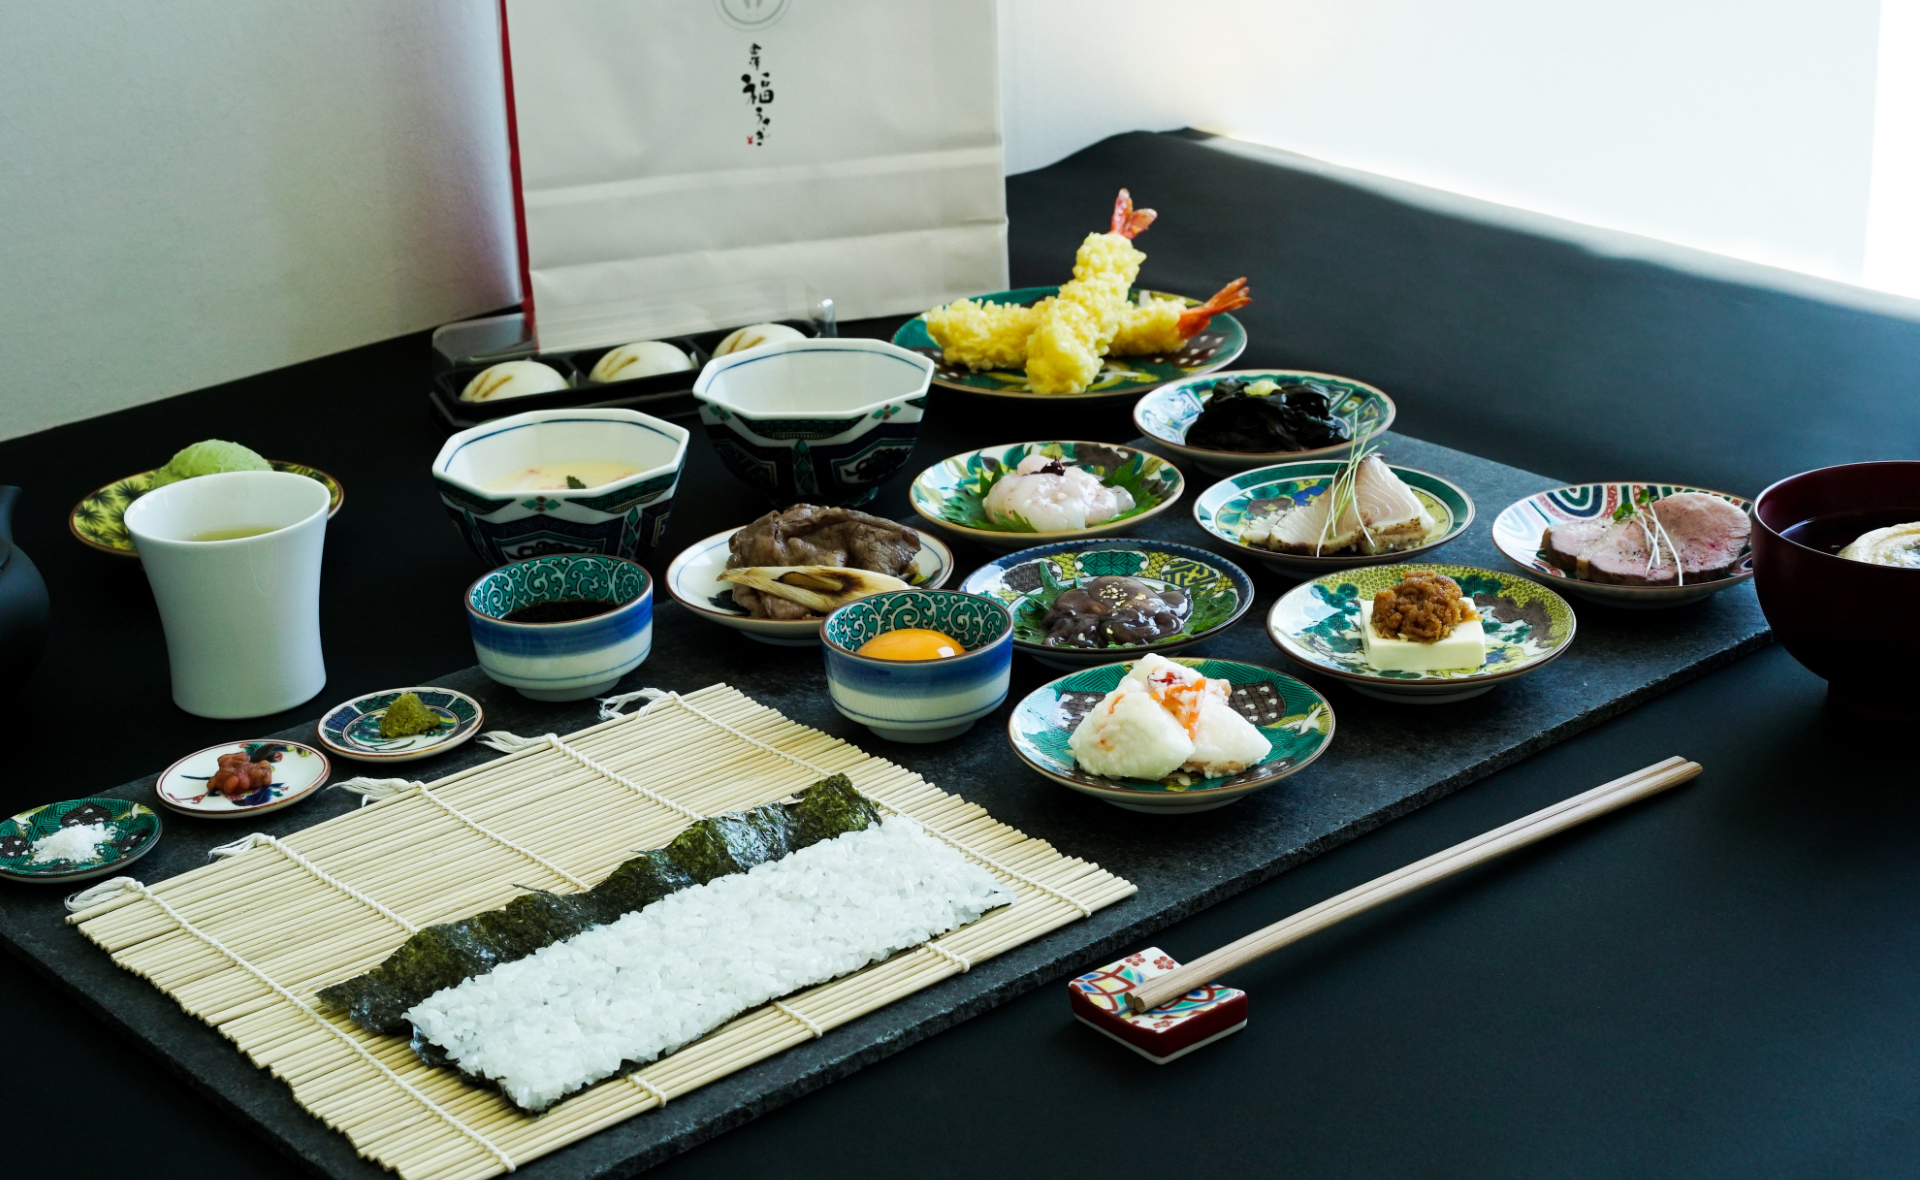 SPECIAL DINNERのイメージ画像です。